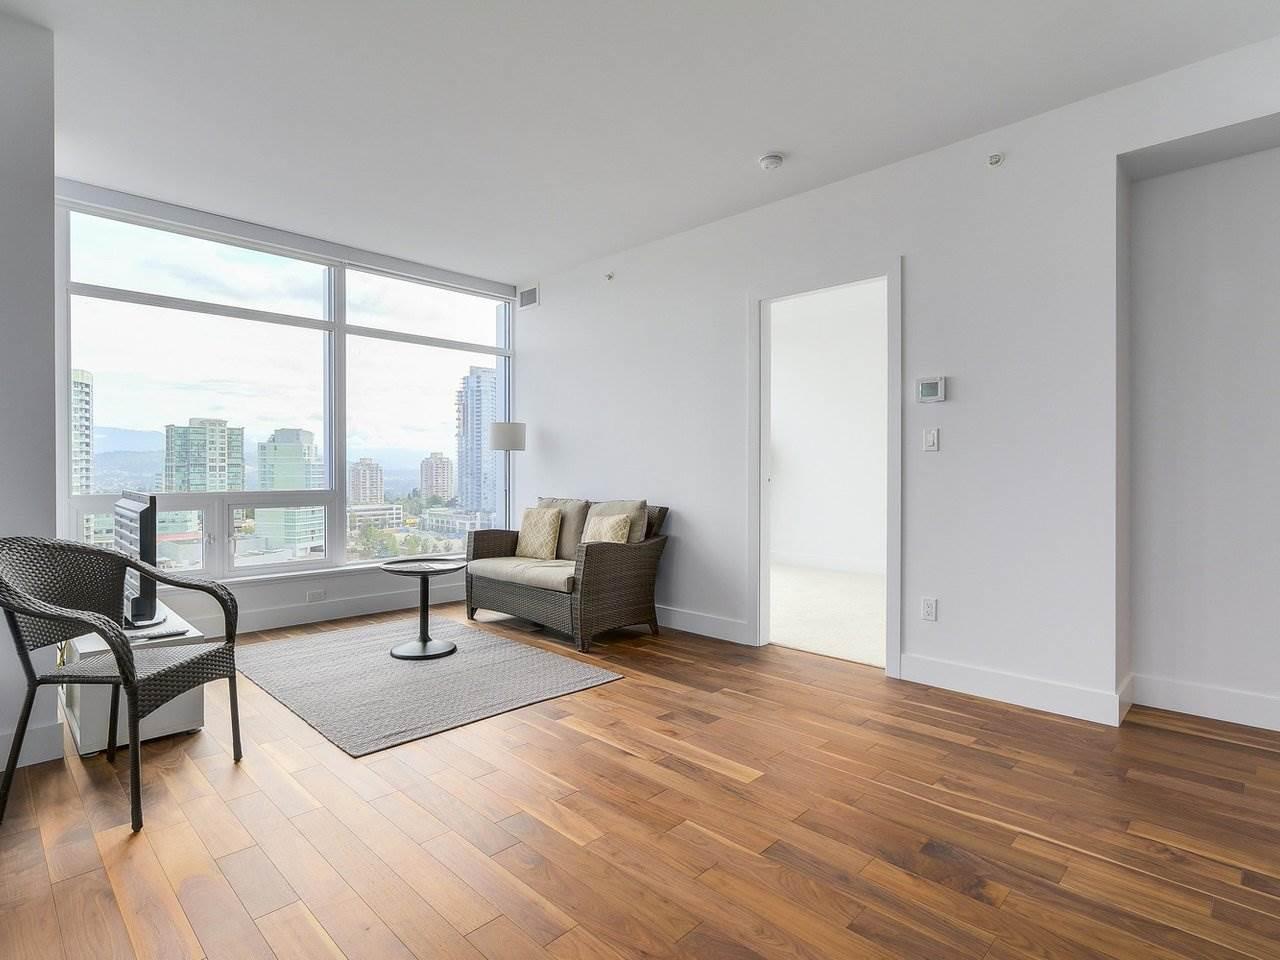 Condo Apartment at 1202 4360 BERESFORD STREET, Unit 1202, Burnaby South, British Columbia. Image 7